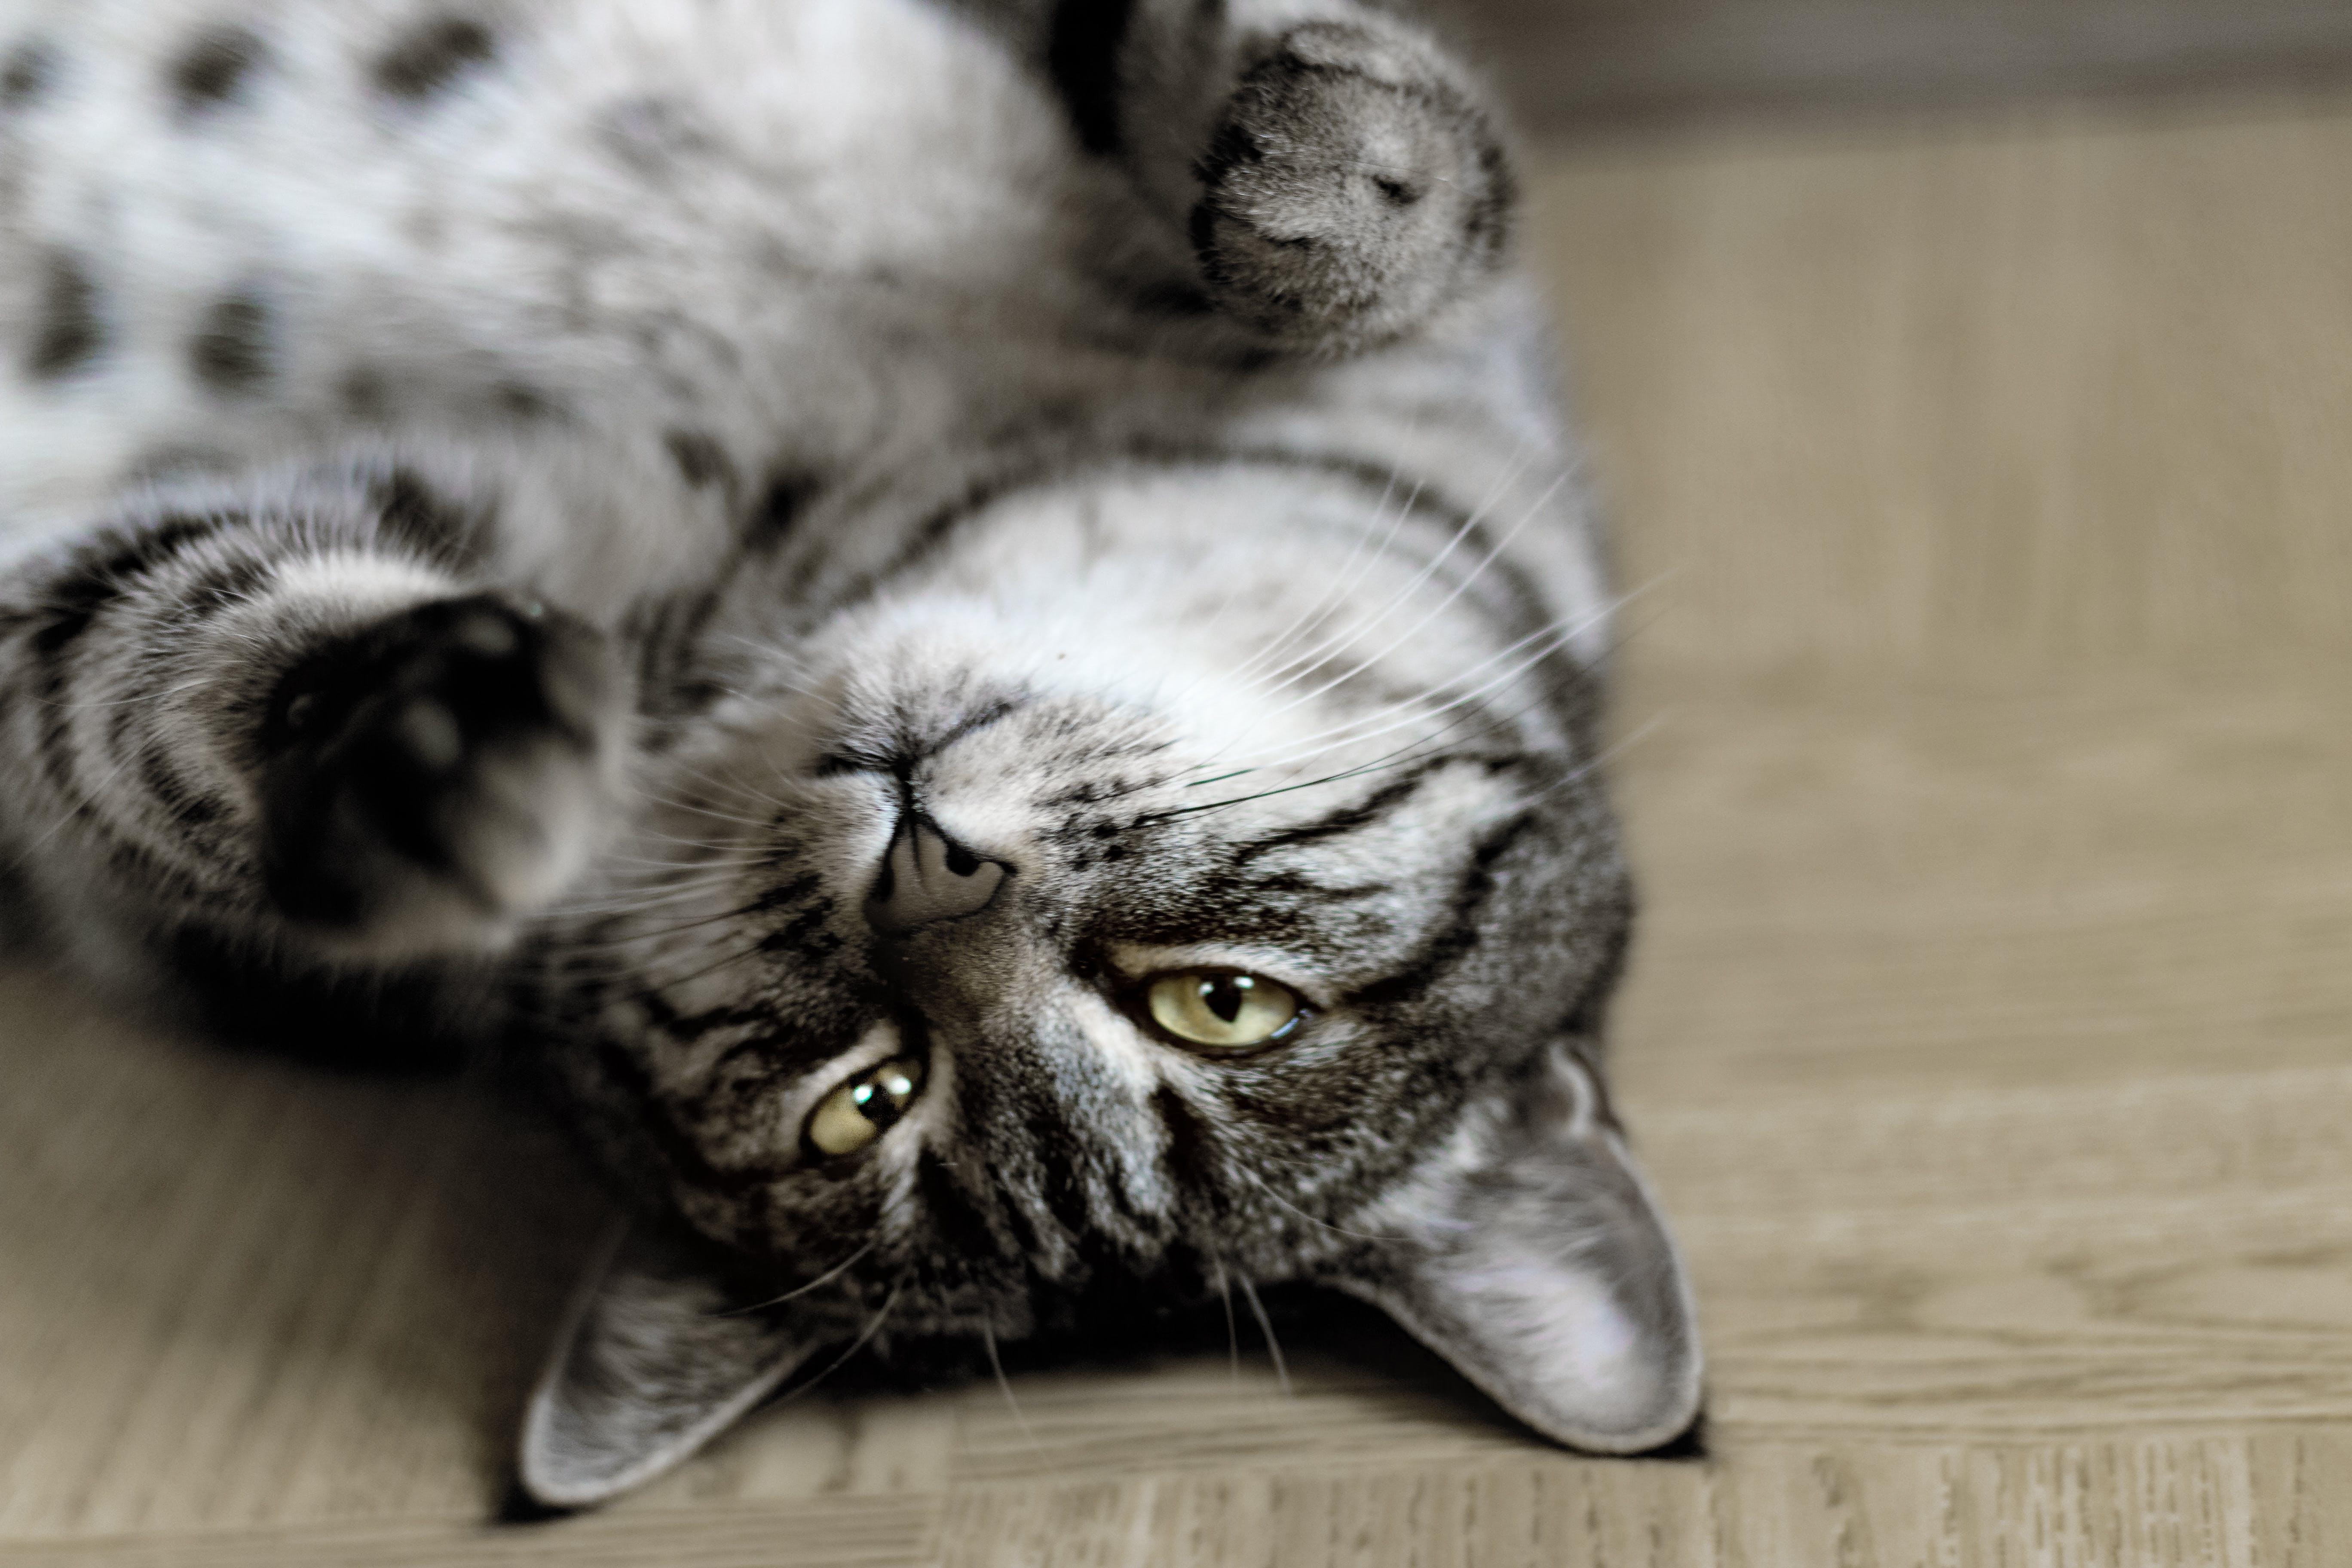 Silver Tabby Cat Lying on Floor Inside Room